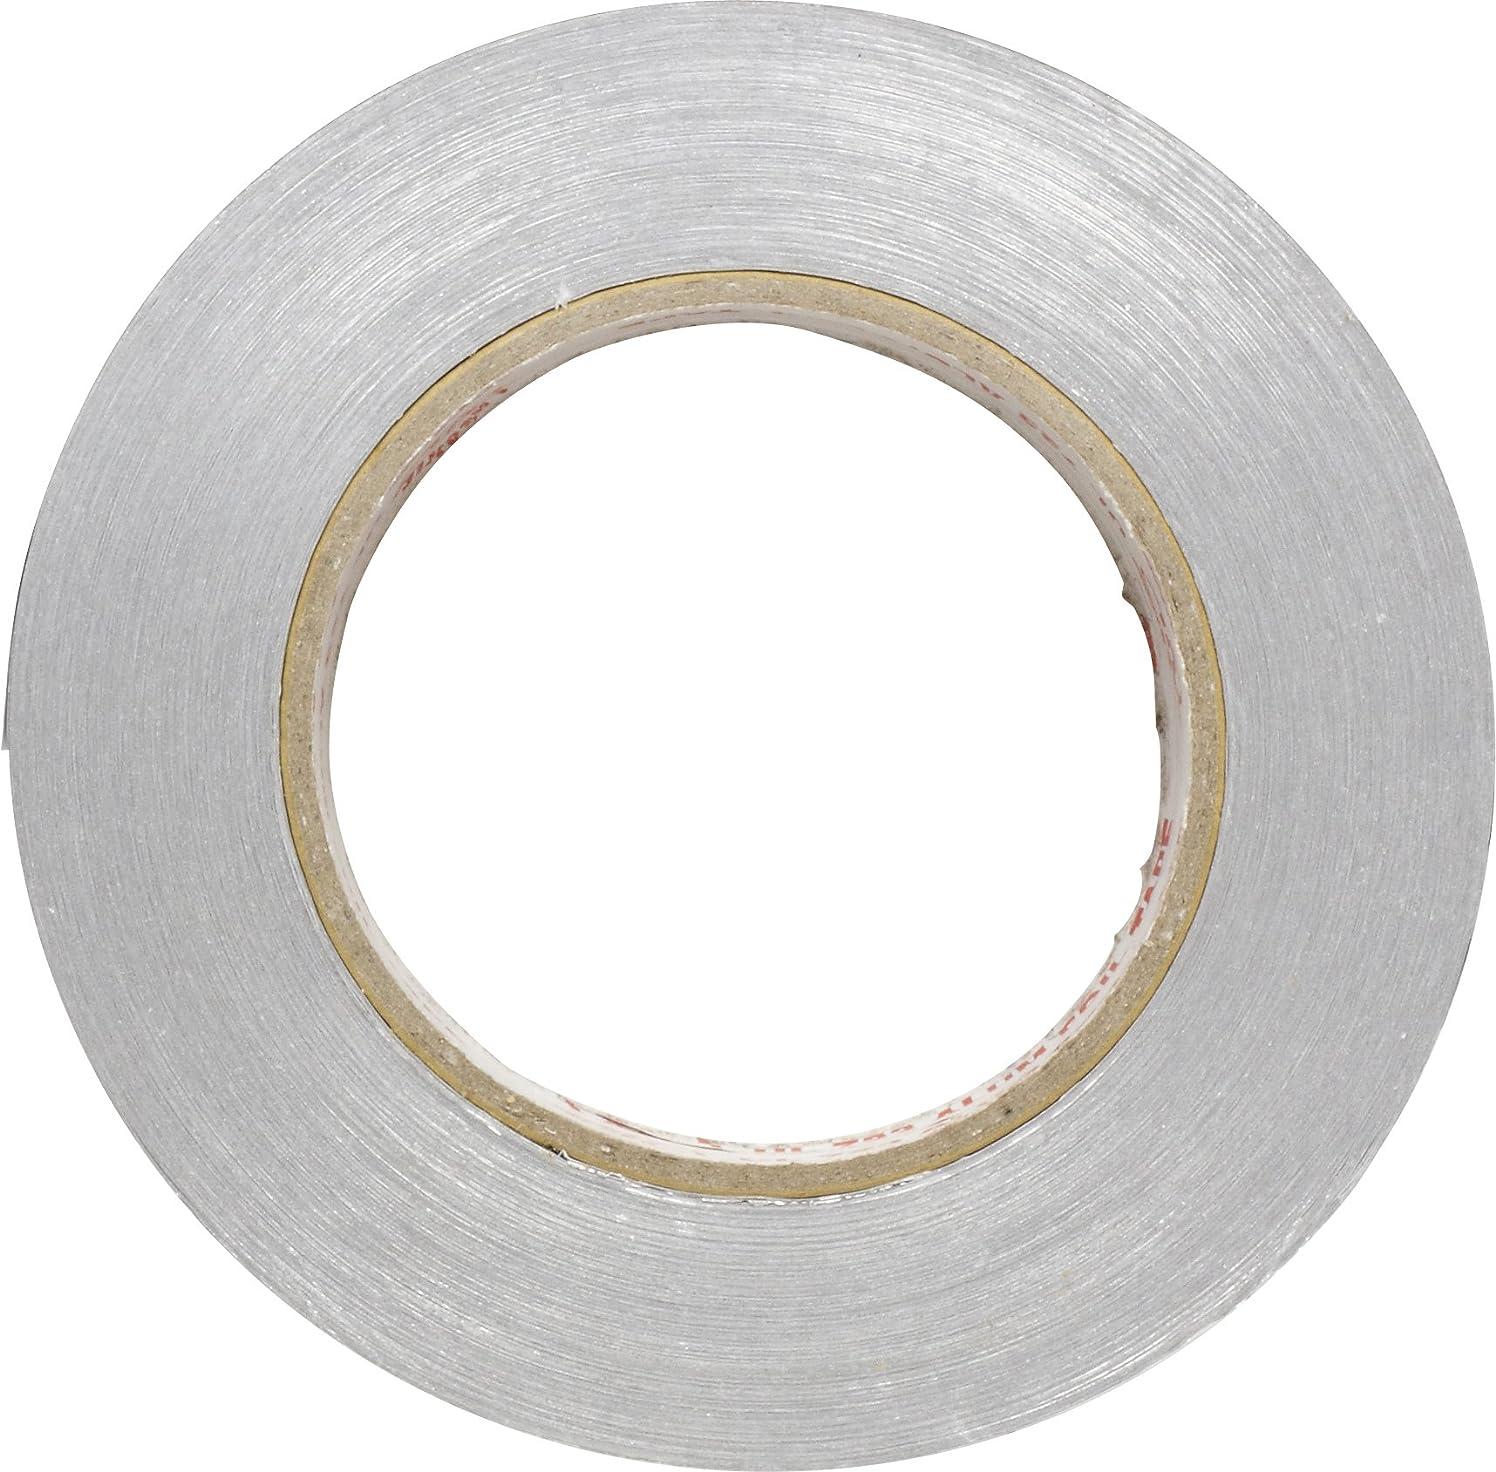 Long Island Development 290 Aluminum Tape 2-Inchx50yd